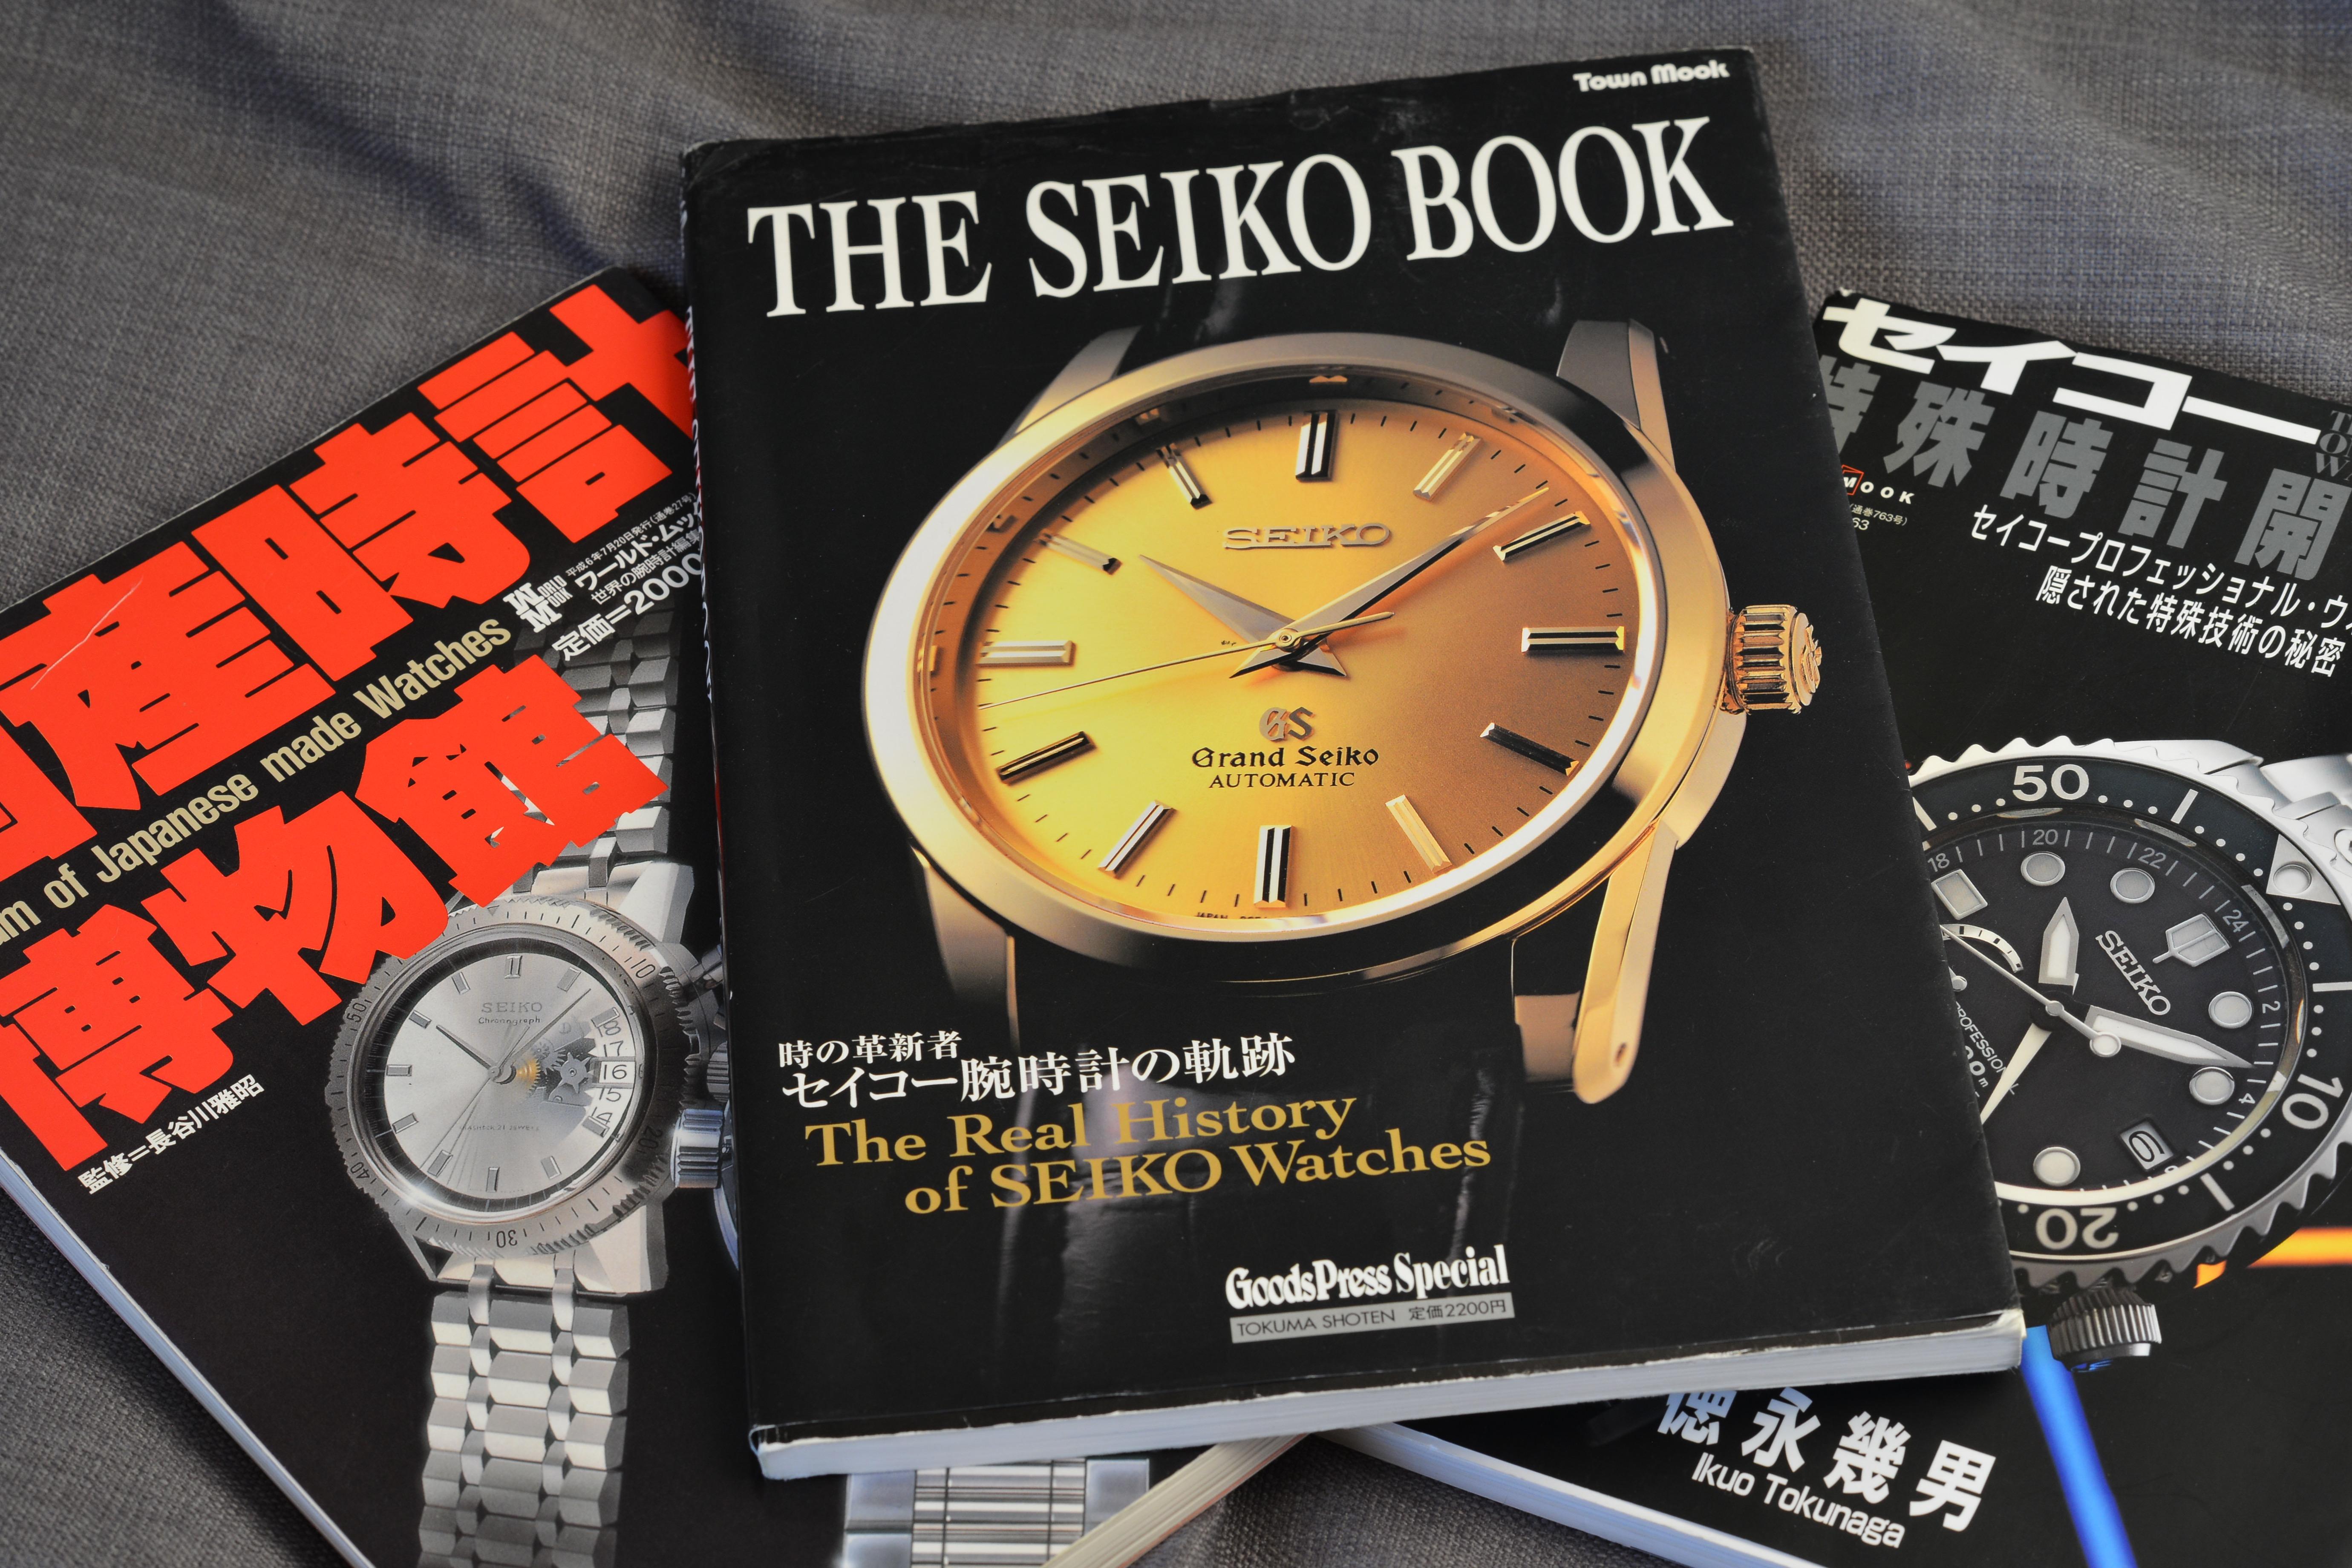 seiko books molle watch rh mollewatch com seiko chronograph watch user manual seiko h023 watch user manual